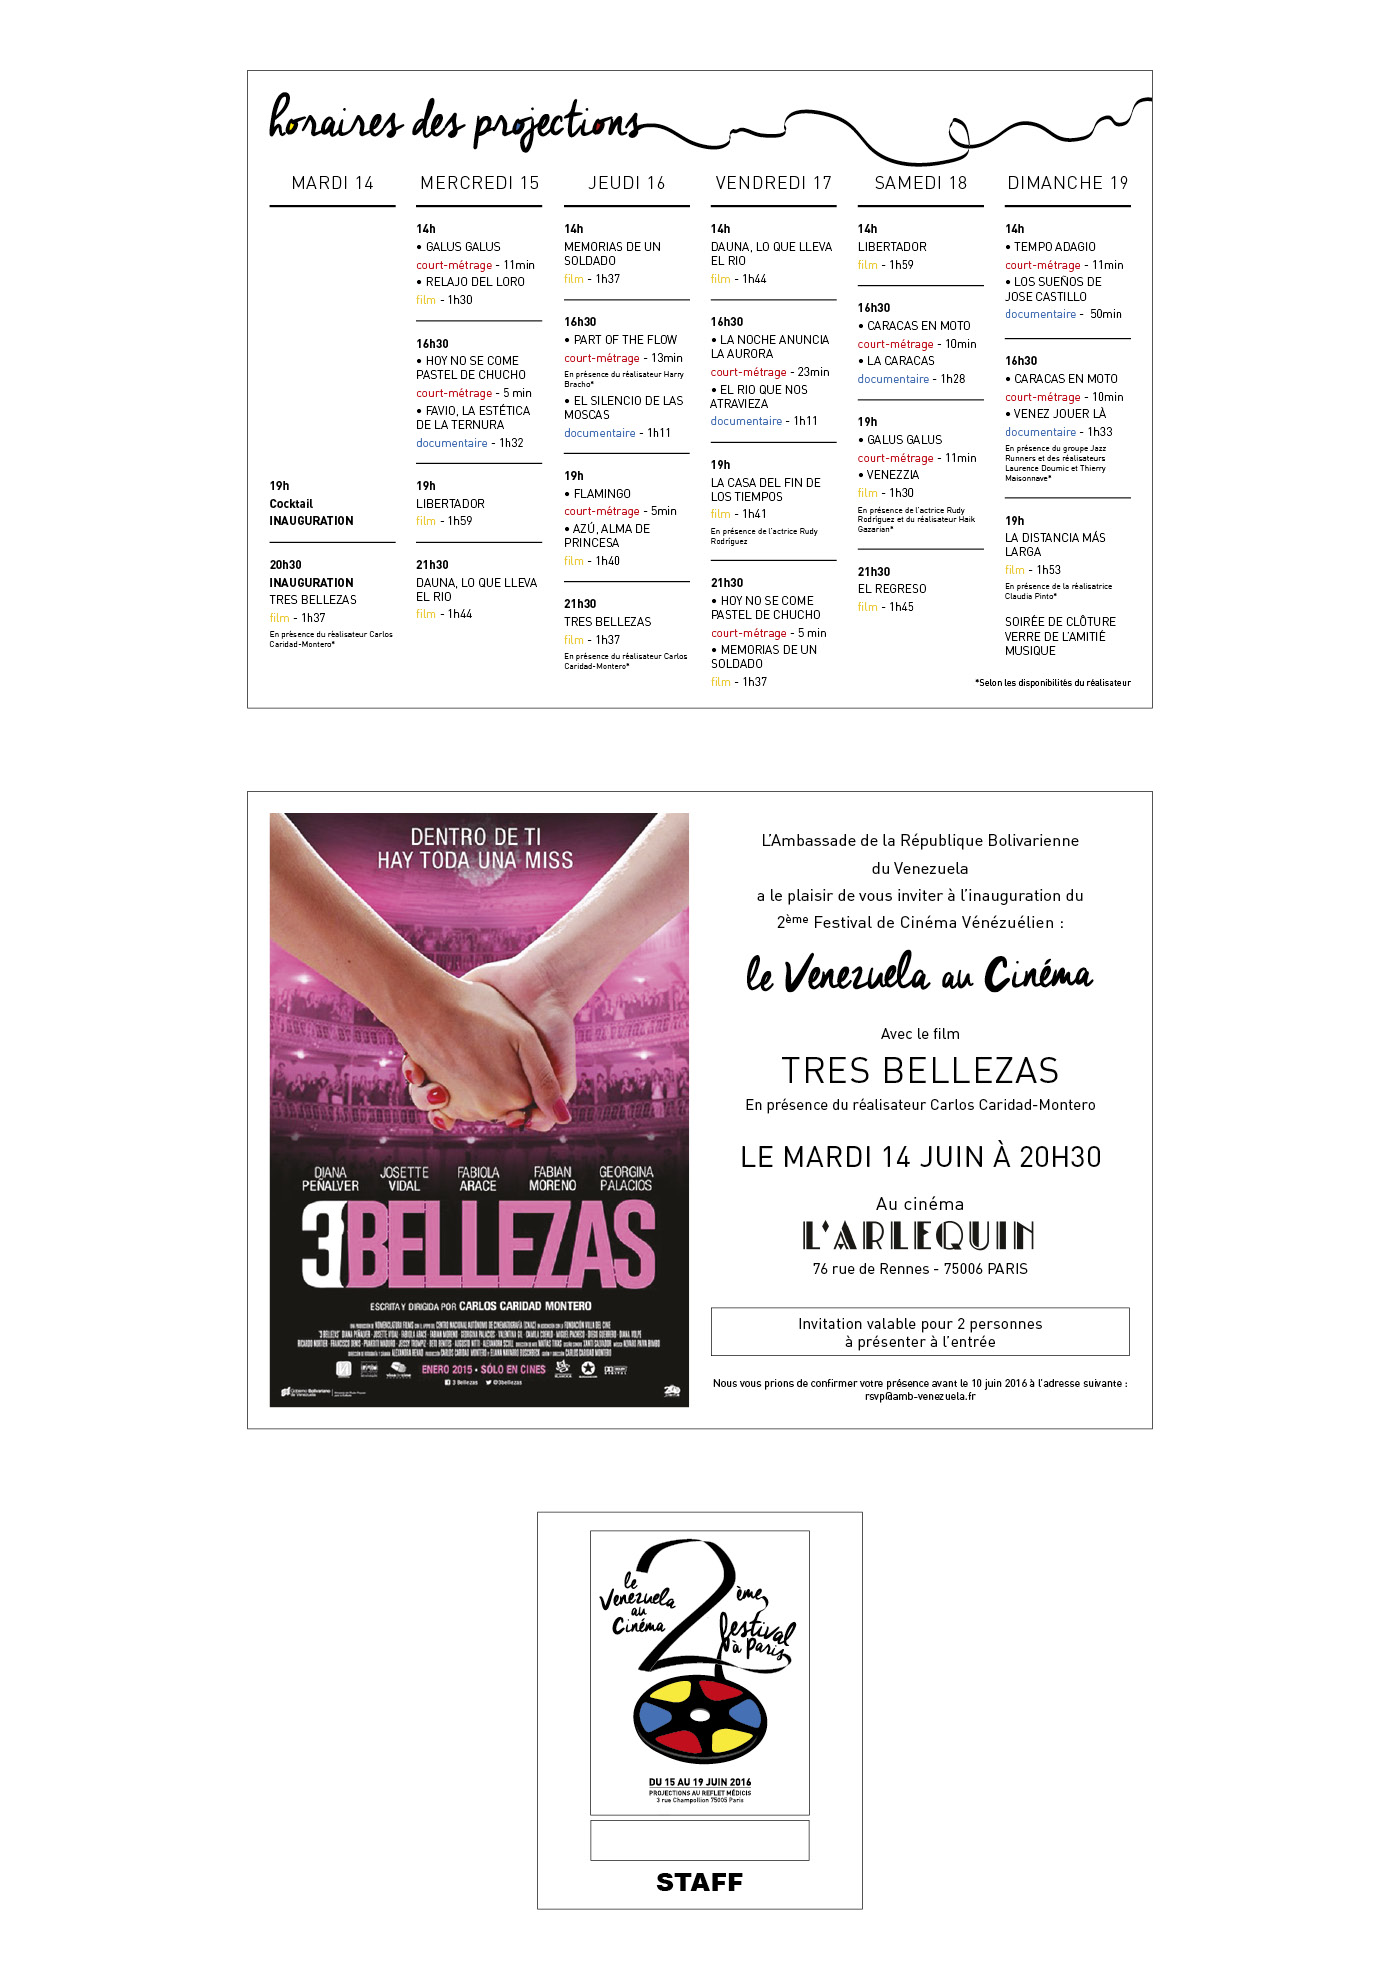 Festival_2016 - Flyer, invitation